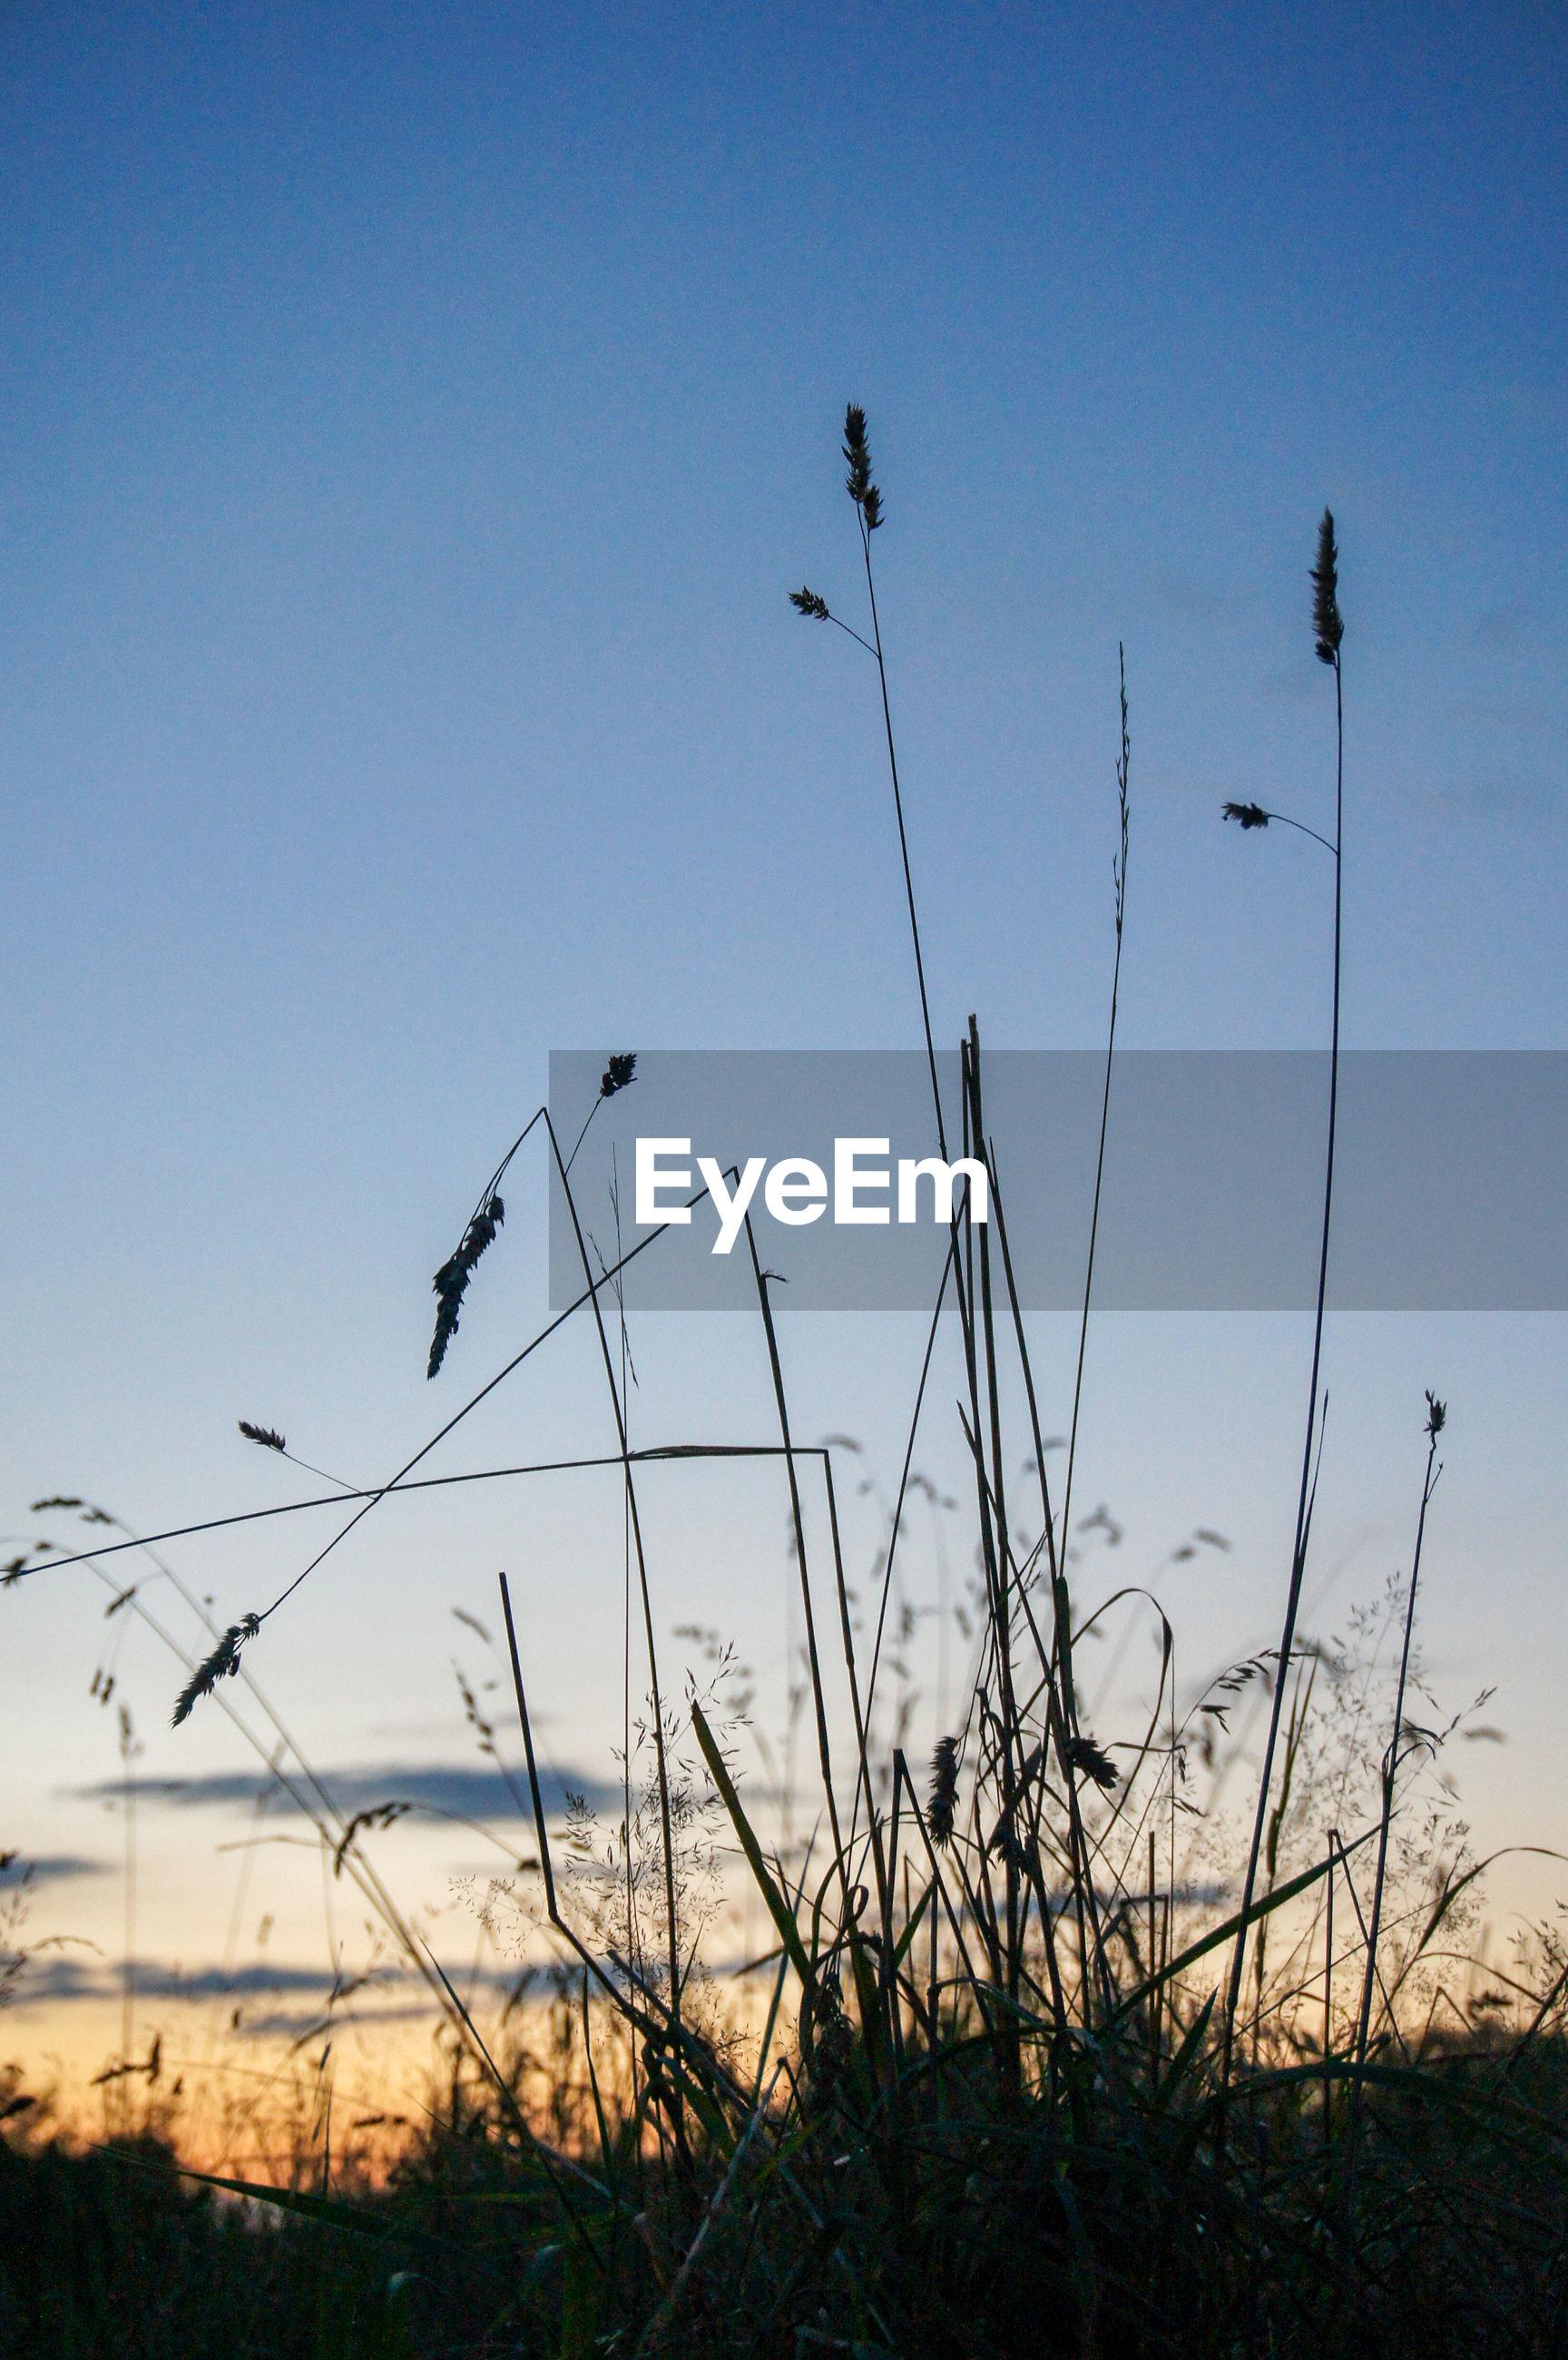 SILHOUETTE OF BIRDS FLYING OVER FIELD AGAINST SKY